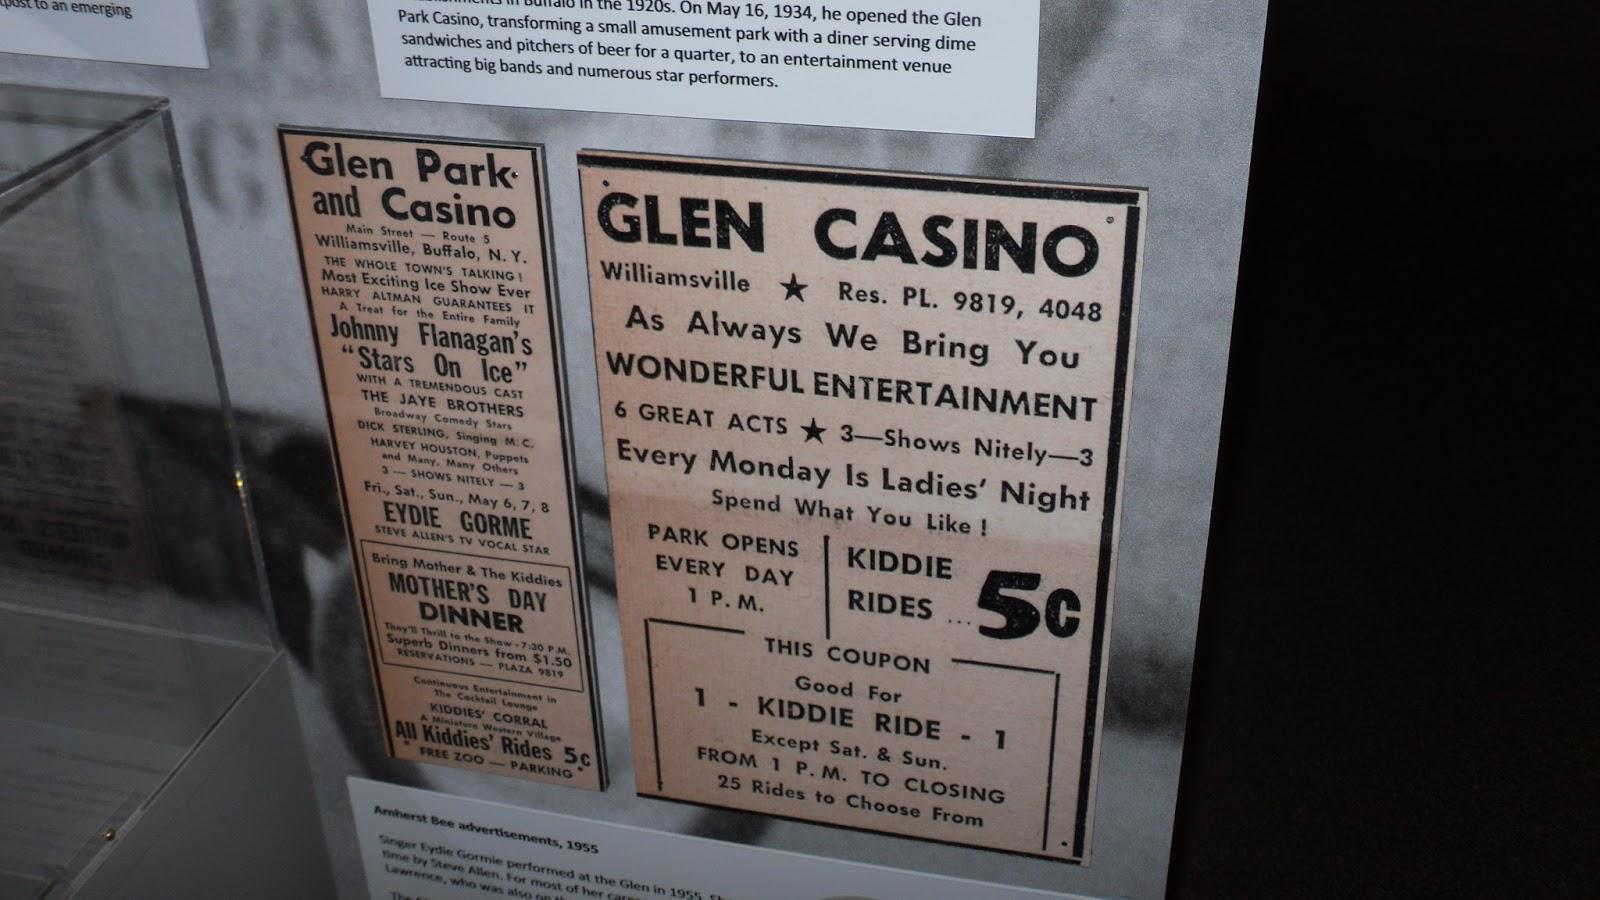 Glen park casino and amusement park new york